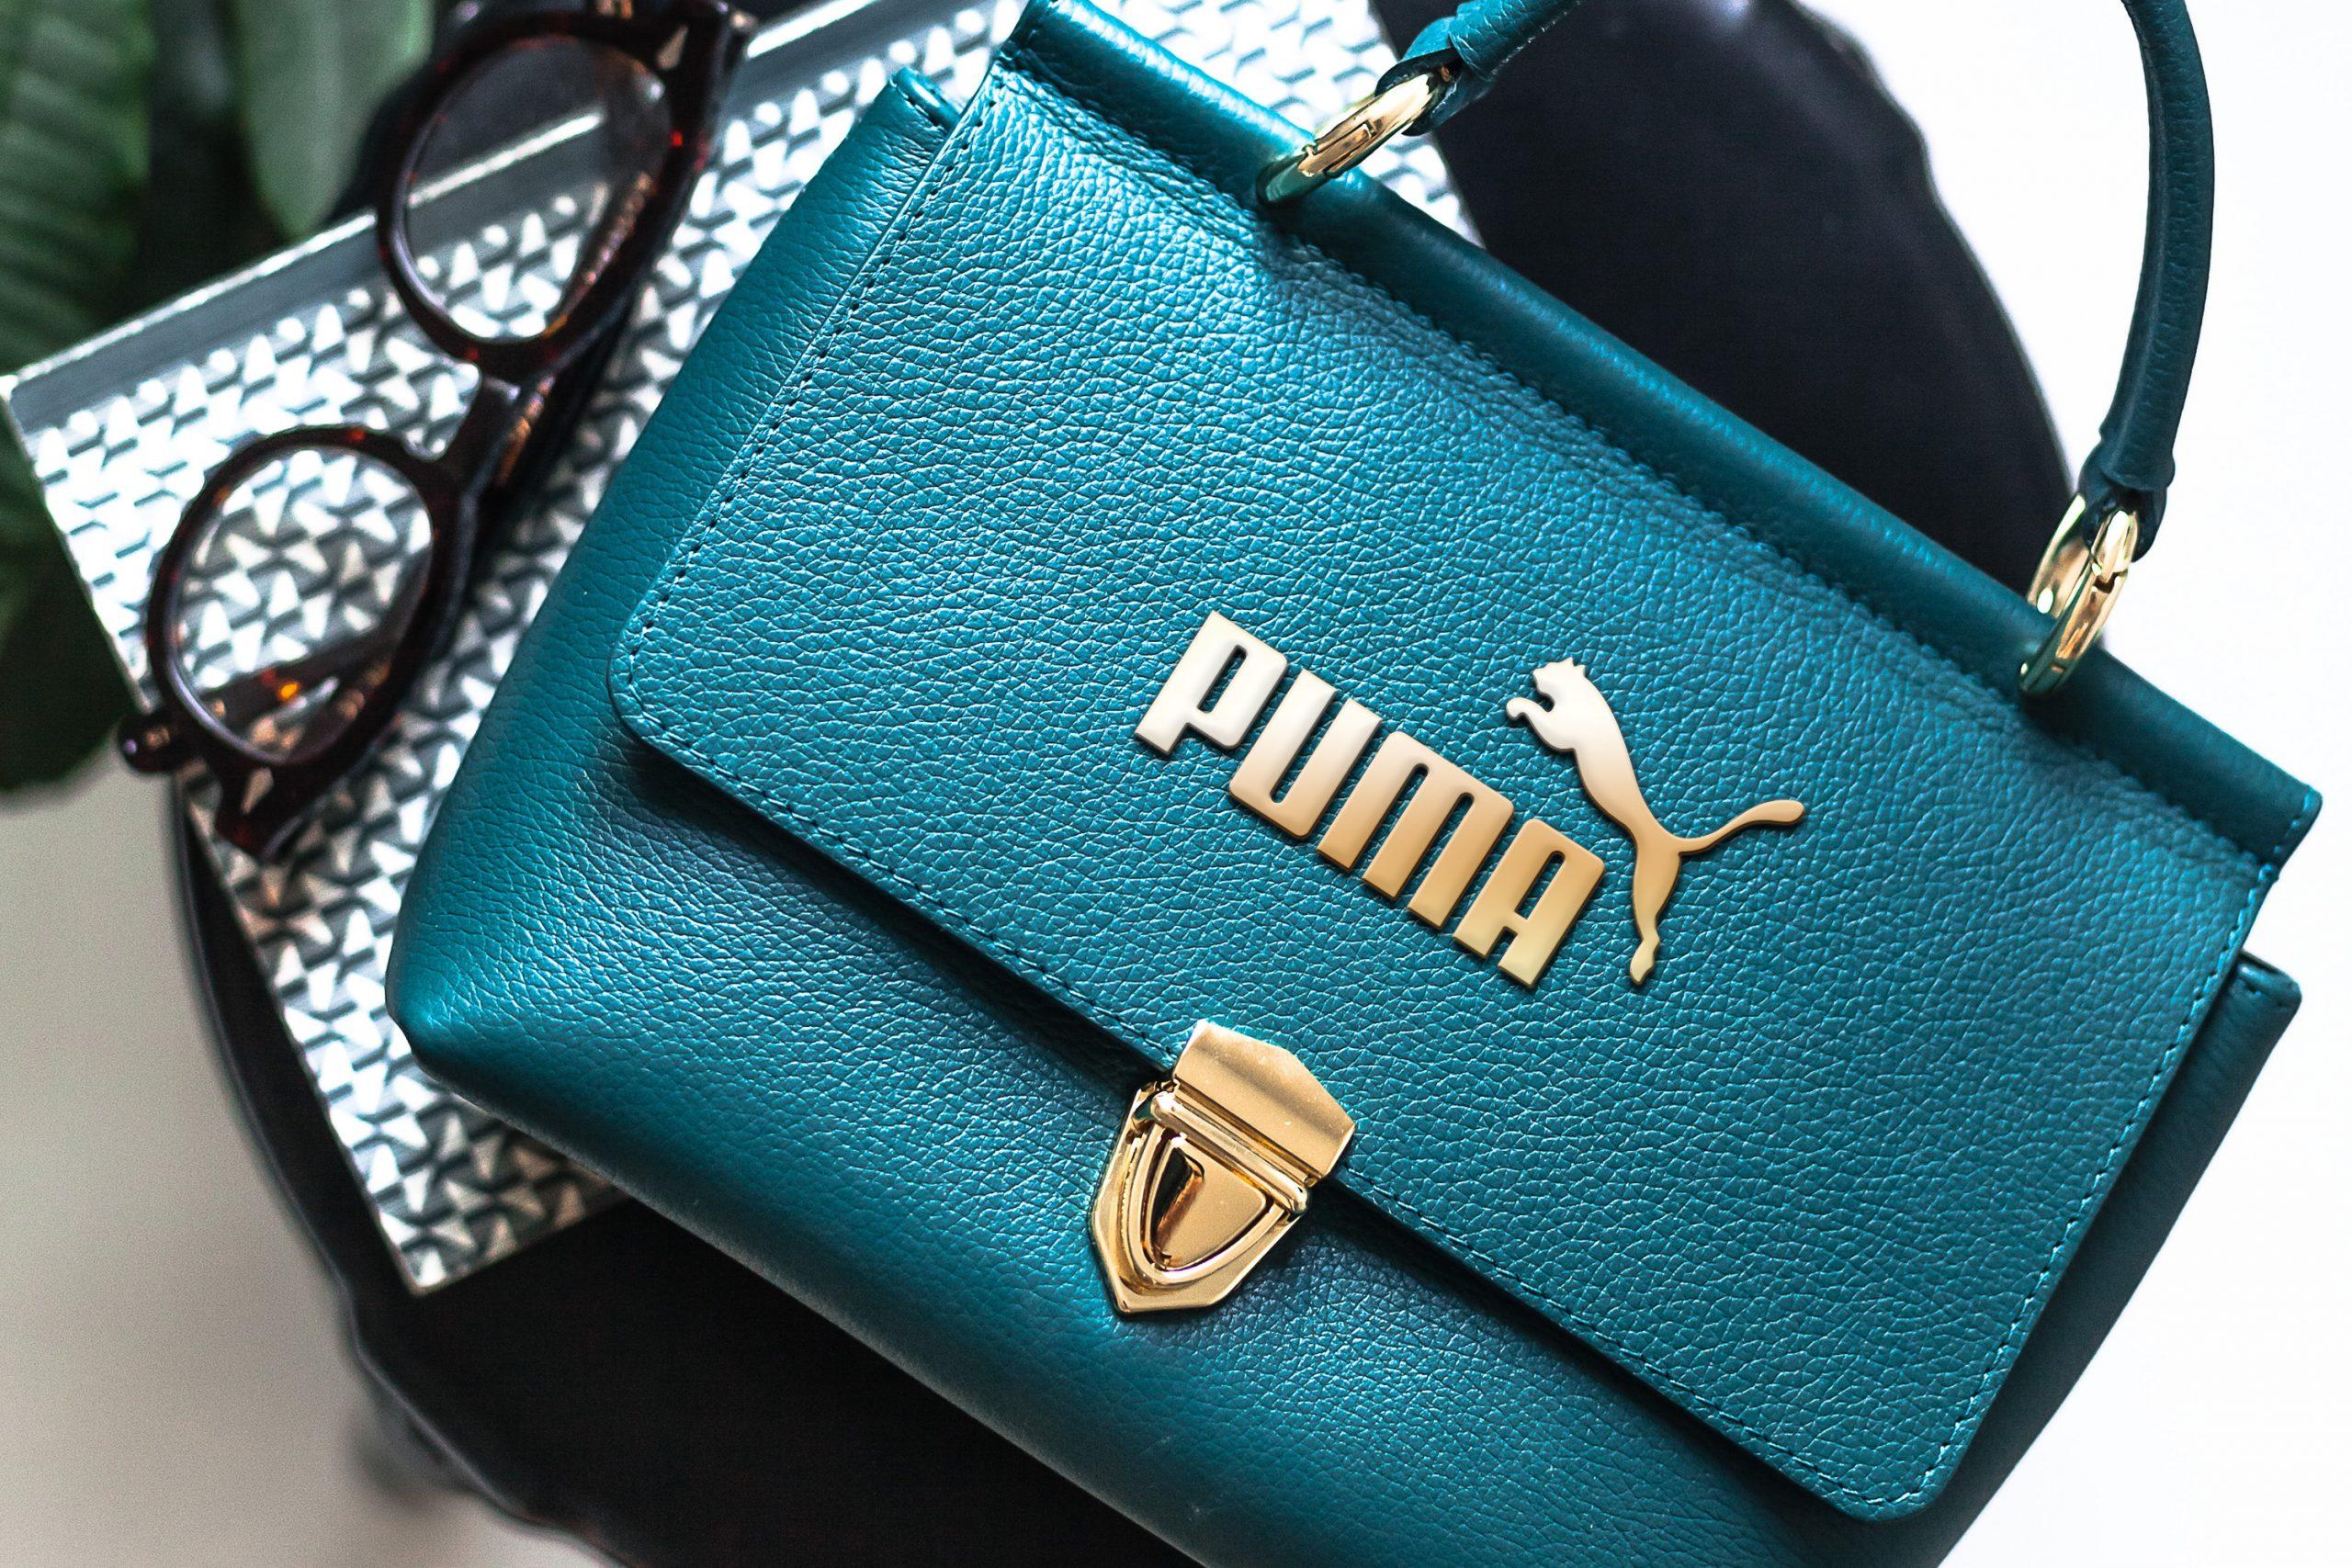 purse metallic logo mockup2 14-sep-21